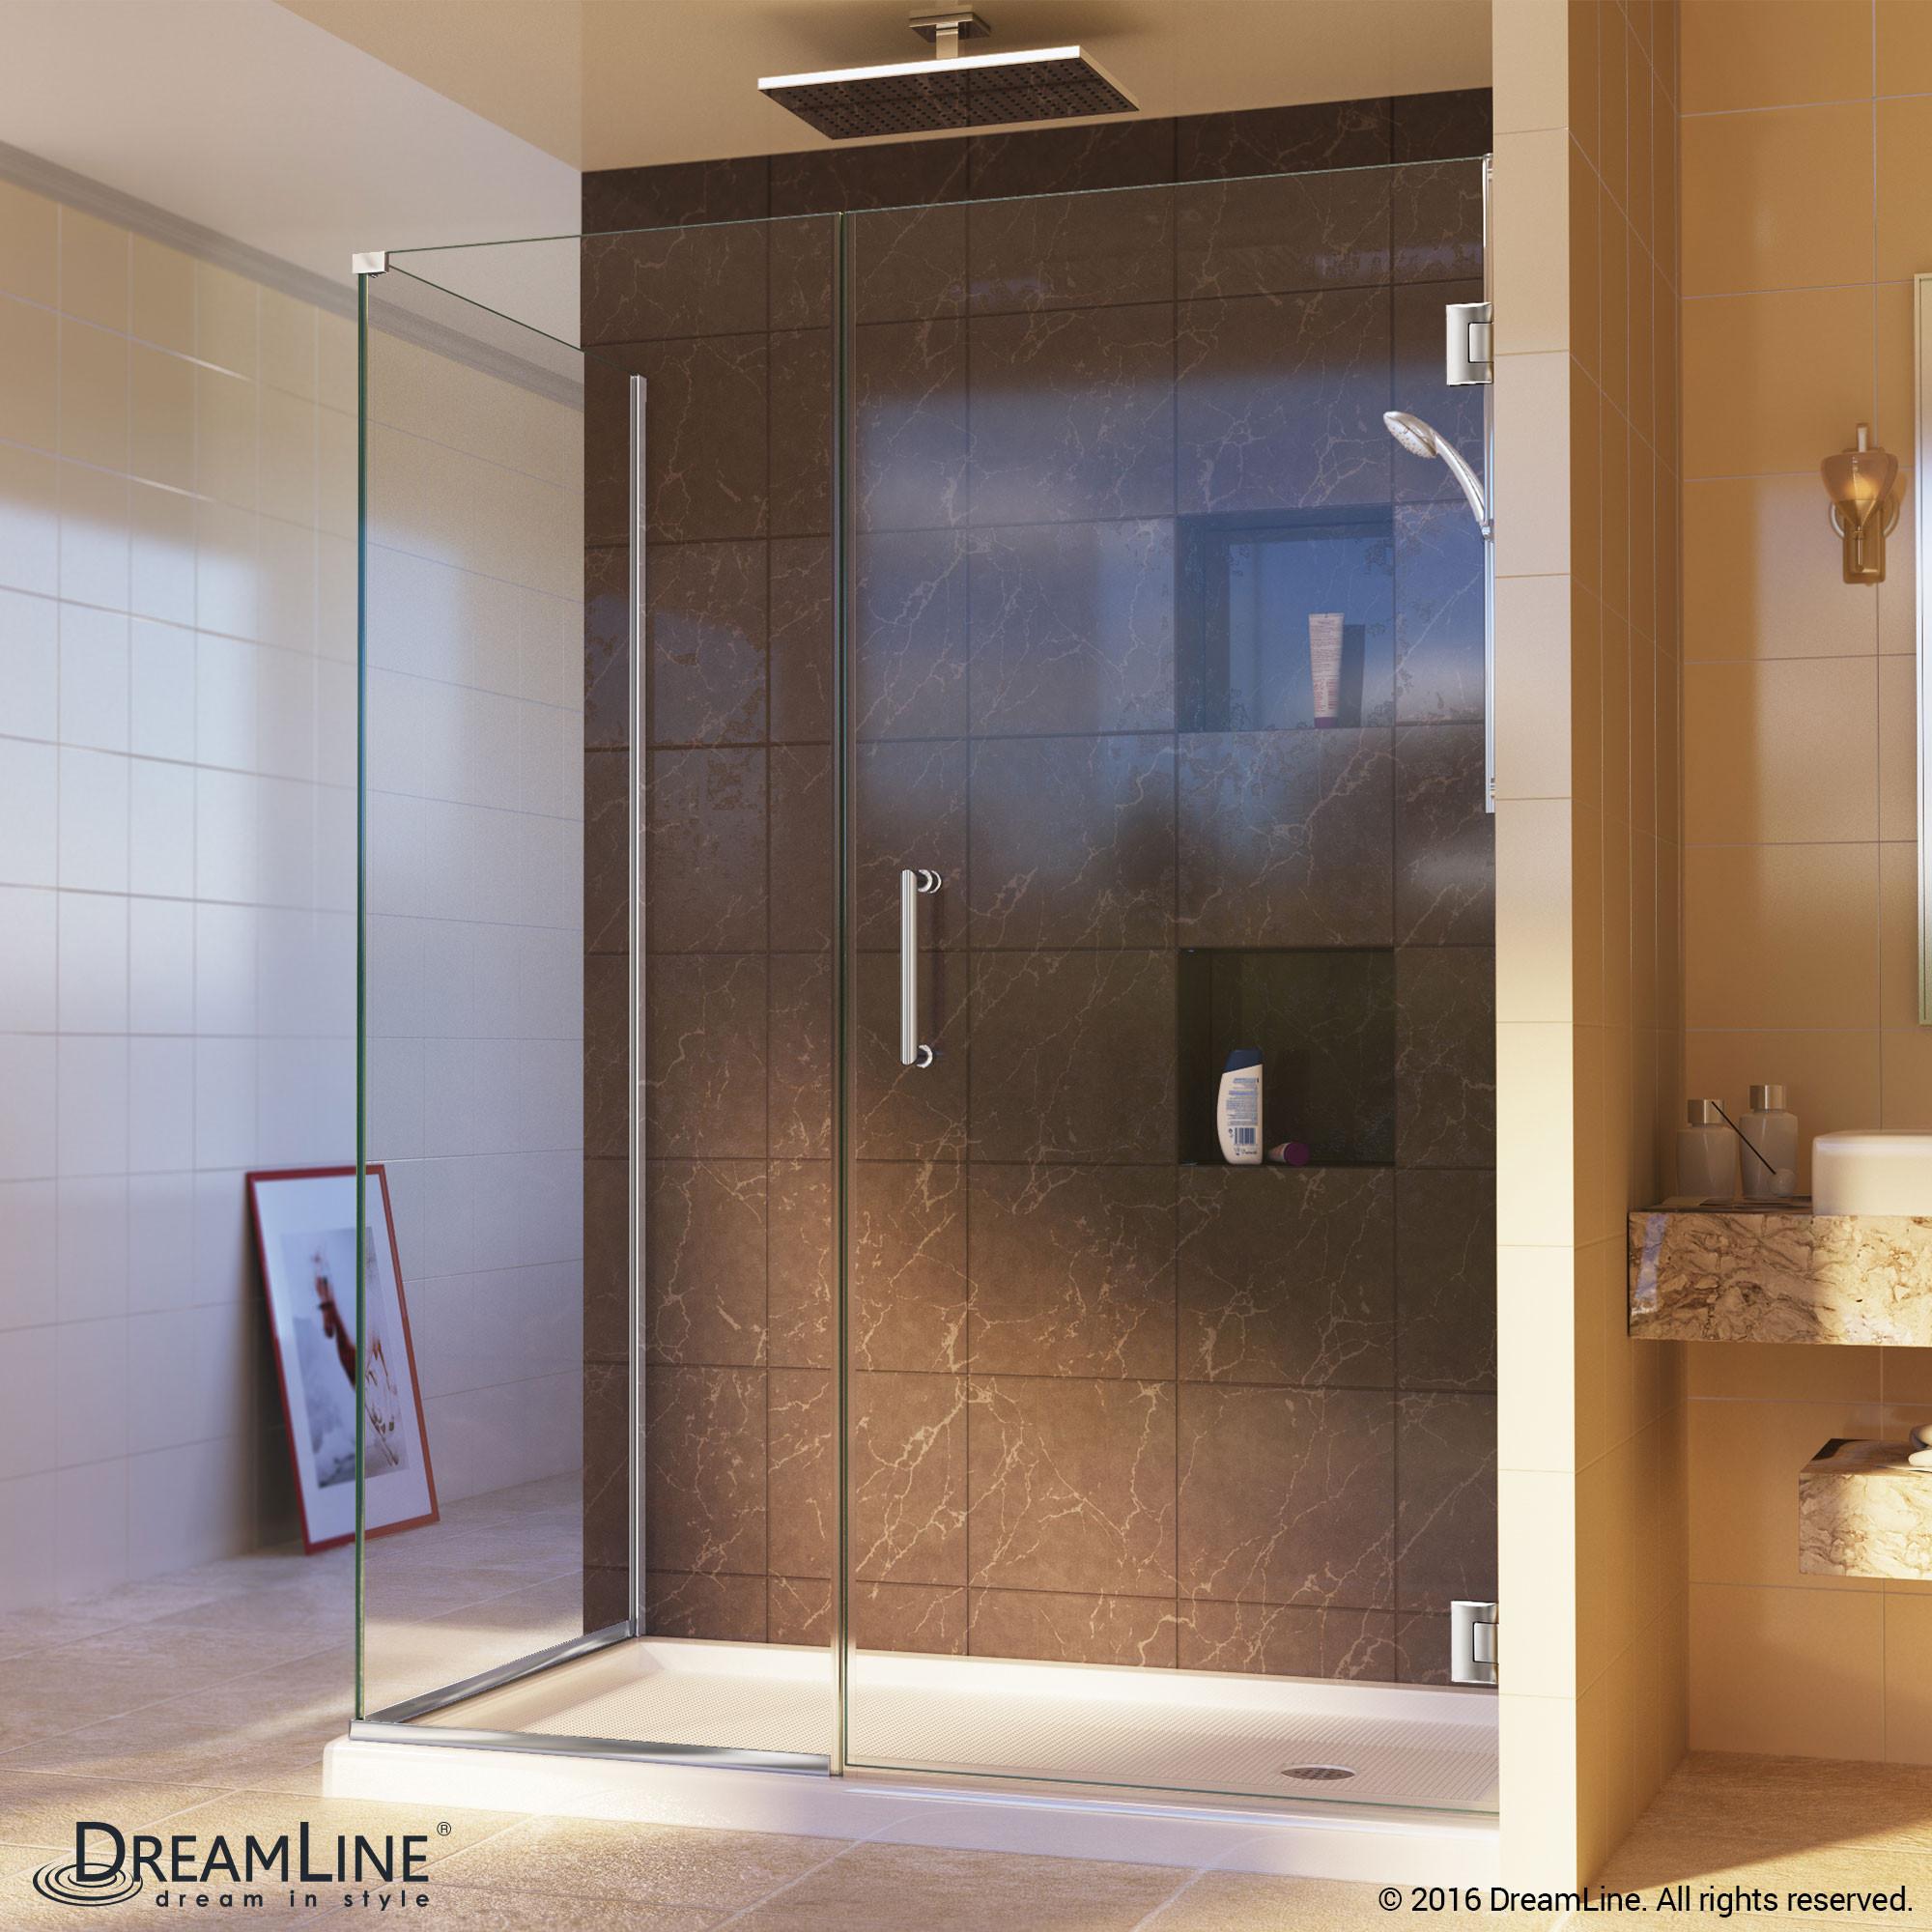 DreamLine SHEN-24485340-01 Unidoor Plus Hinged Shower Enclosure In Chrome Finish Hardware